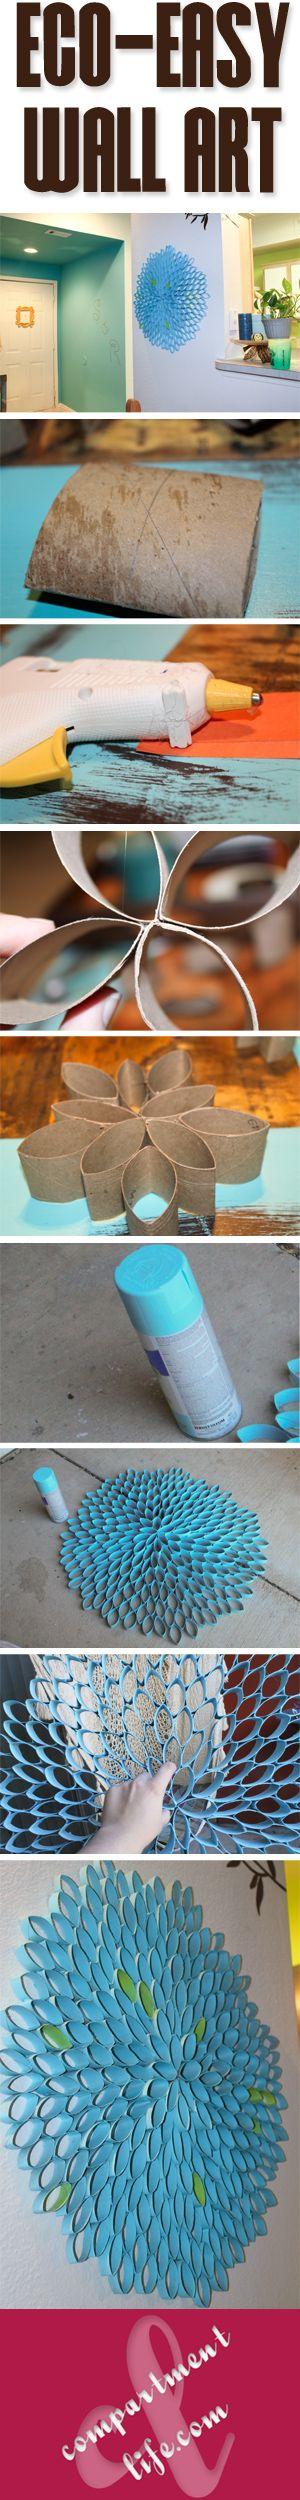 Toilet Paper Roll Art